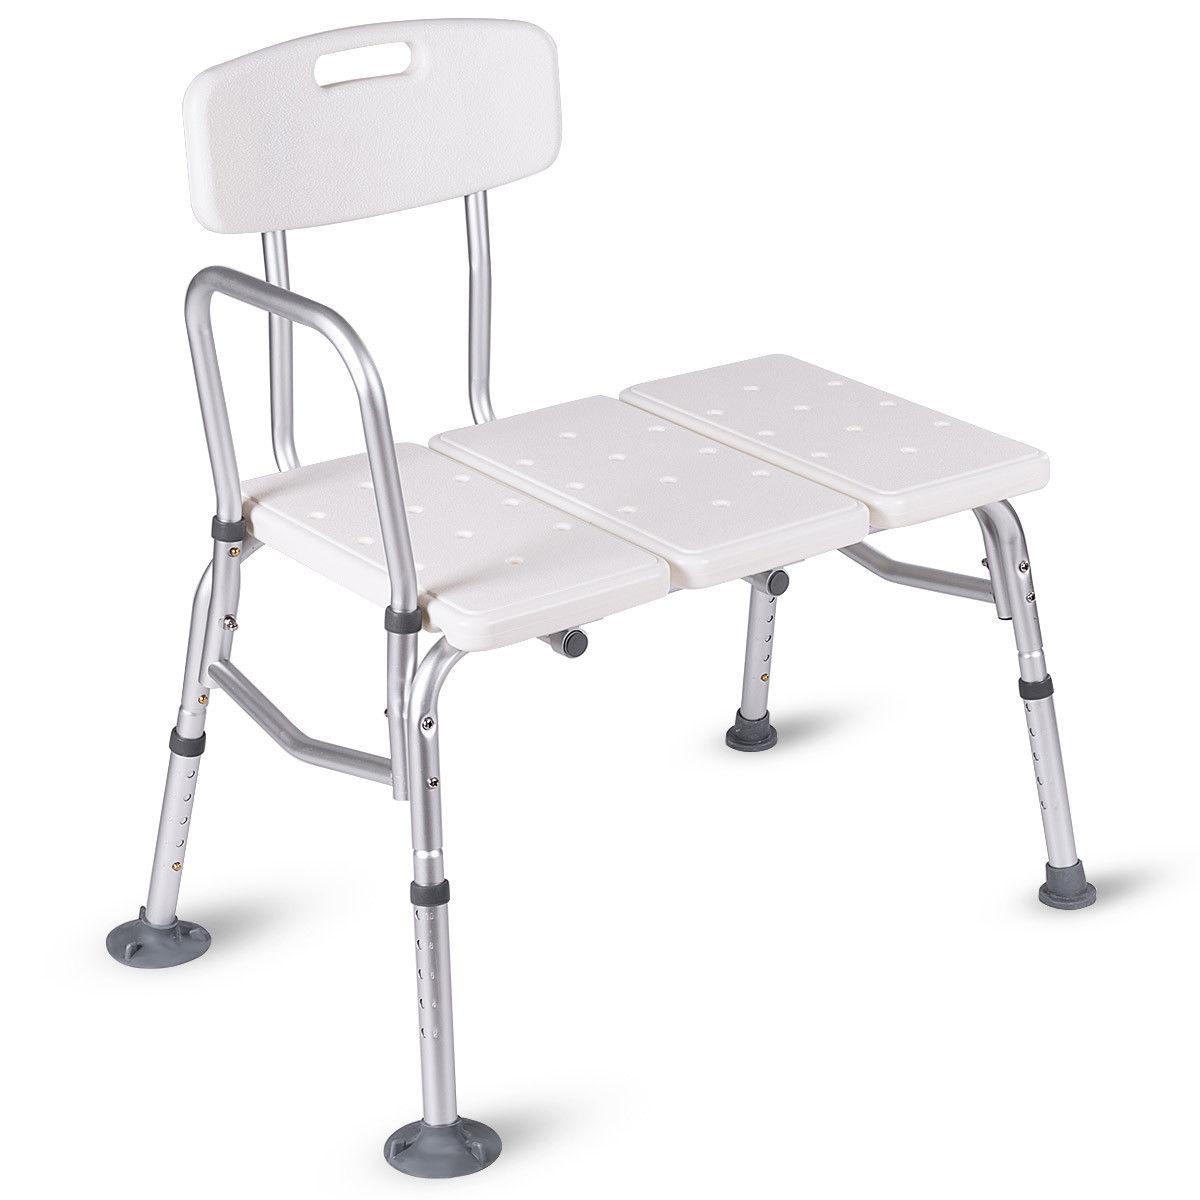 Costway Shower Bath Seat Medical Adjustable Bathroom Bath